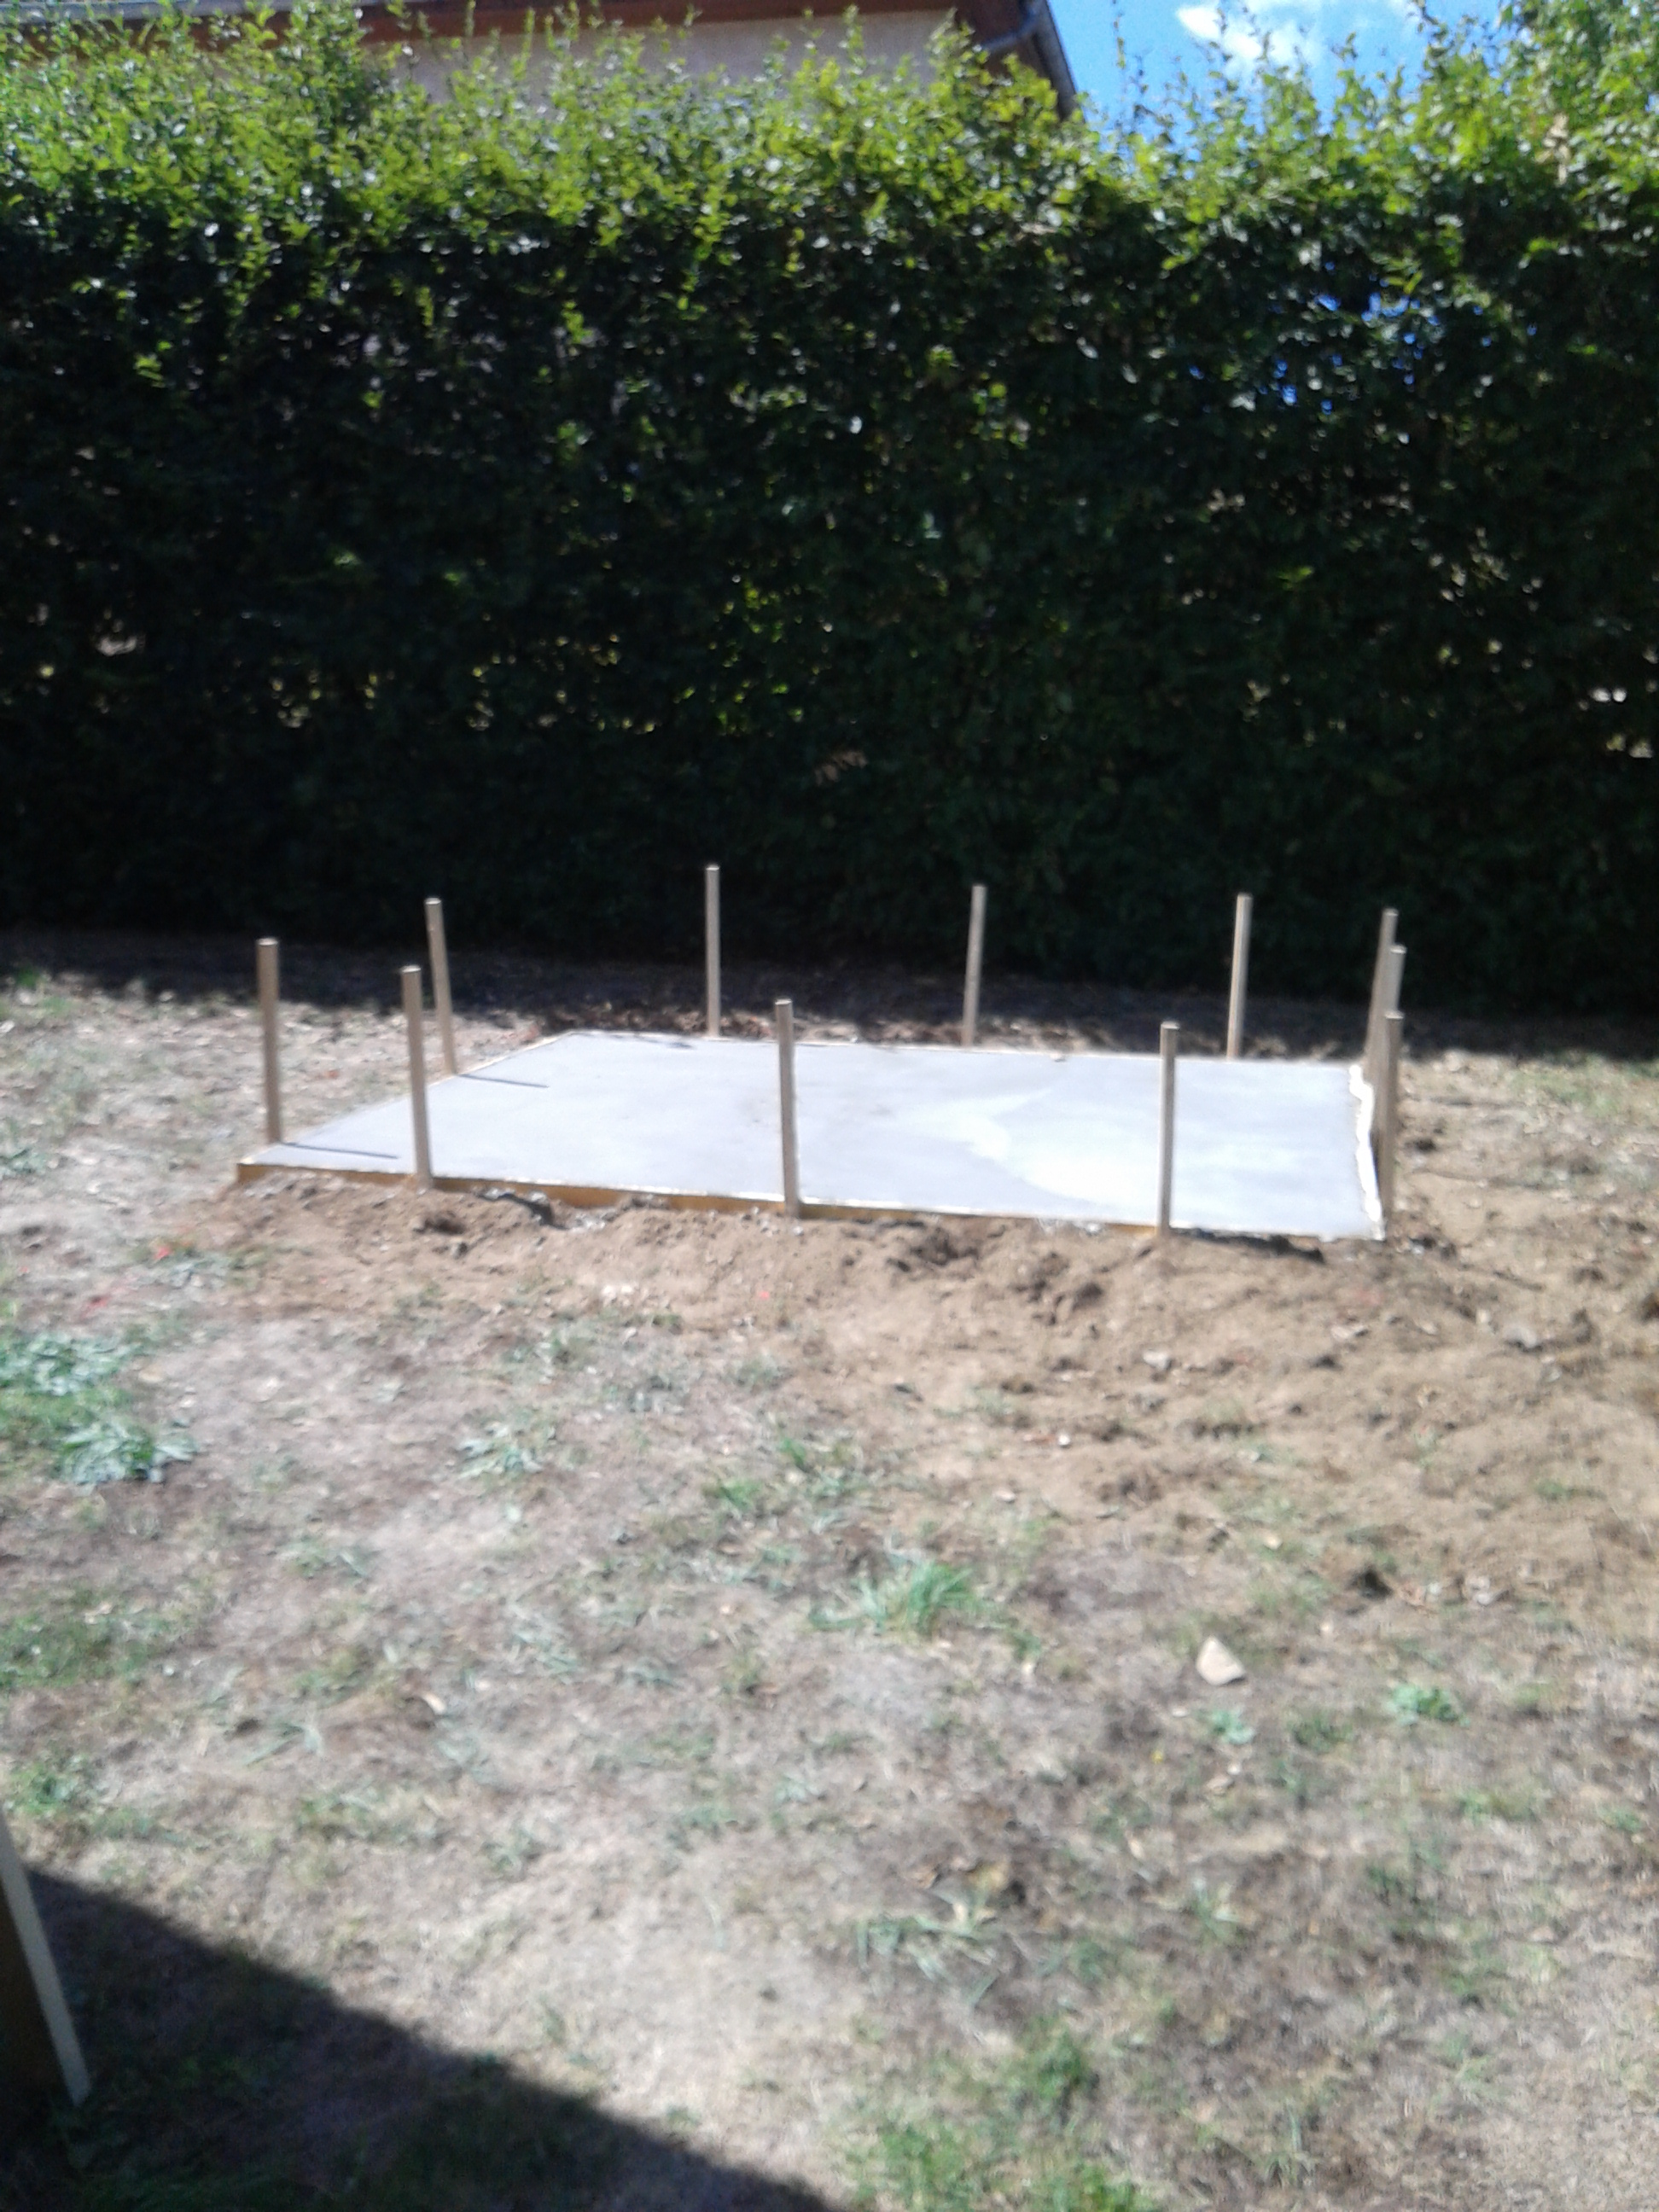 Abri jardin niollet coordination travaux nct for Abri de jardin declaration de travaux